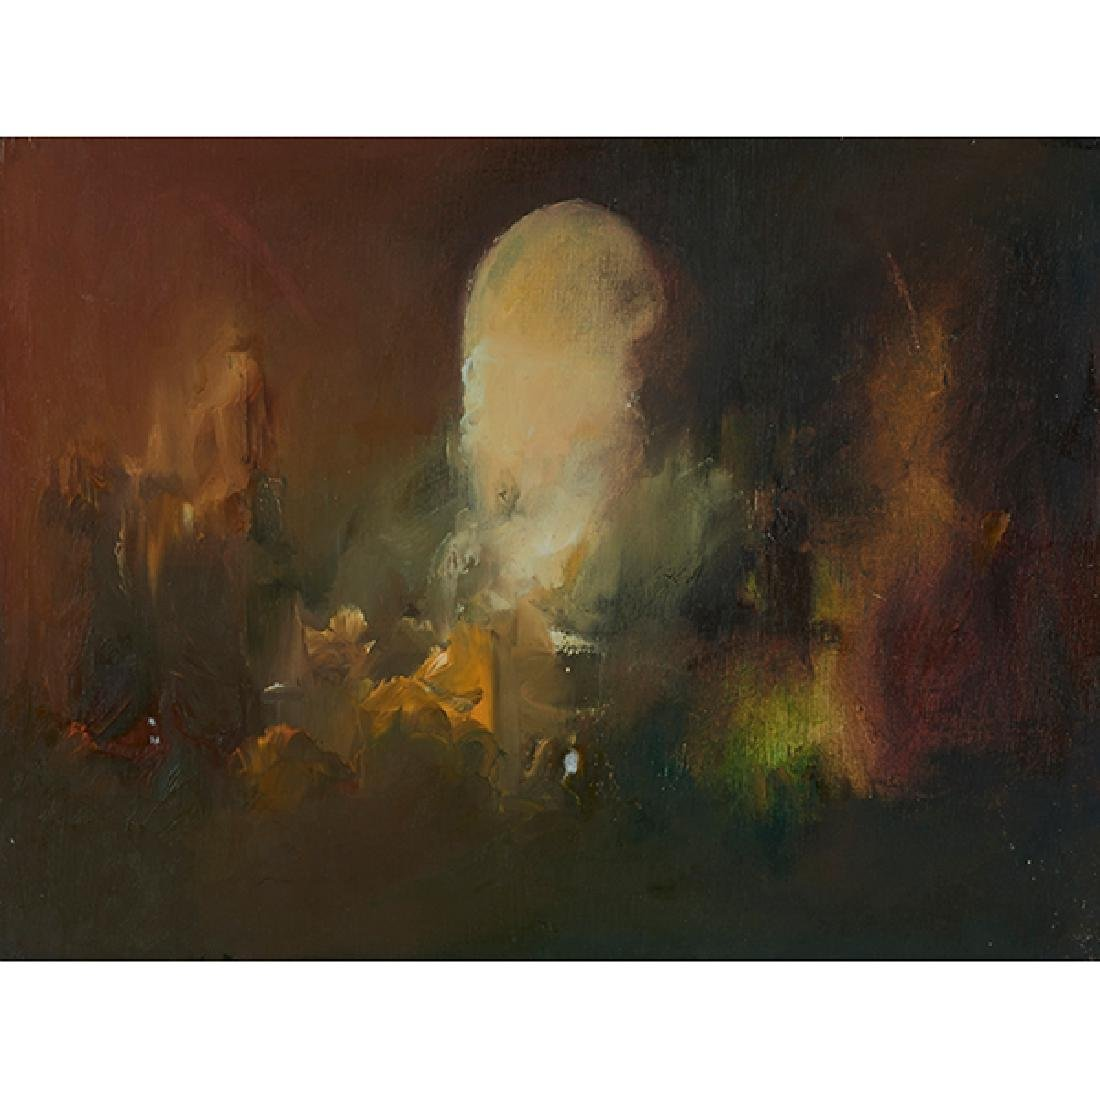 Paul Kenny, (Irish, b. 1960), Altar Piece, St. Marks